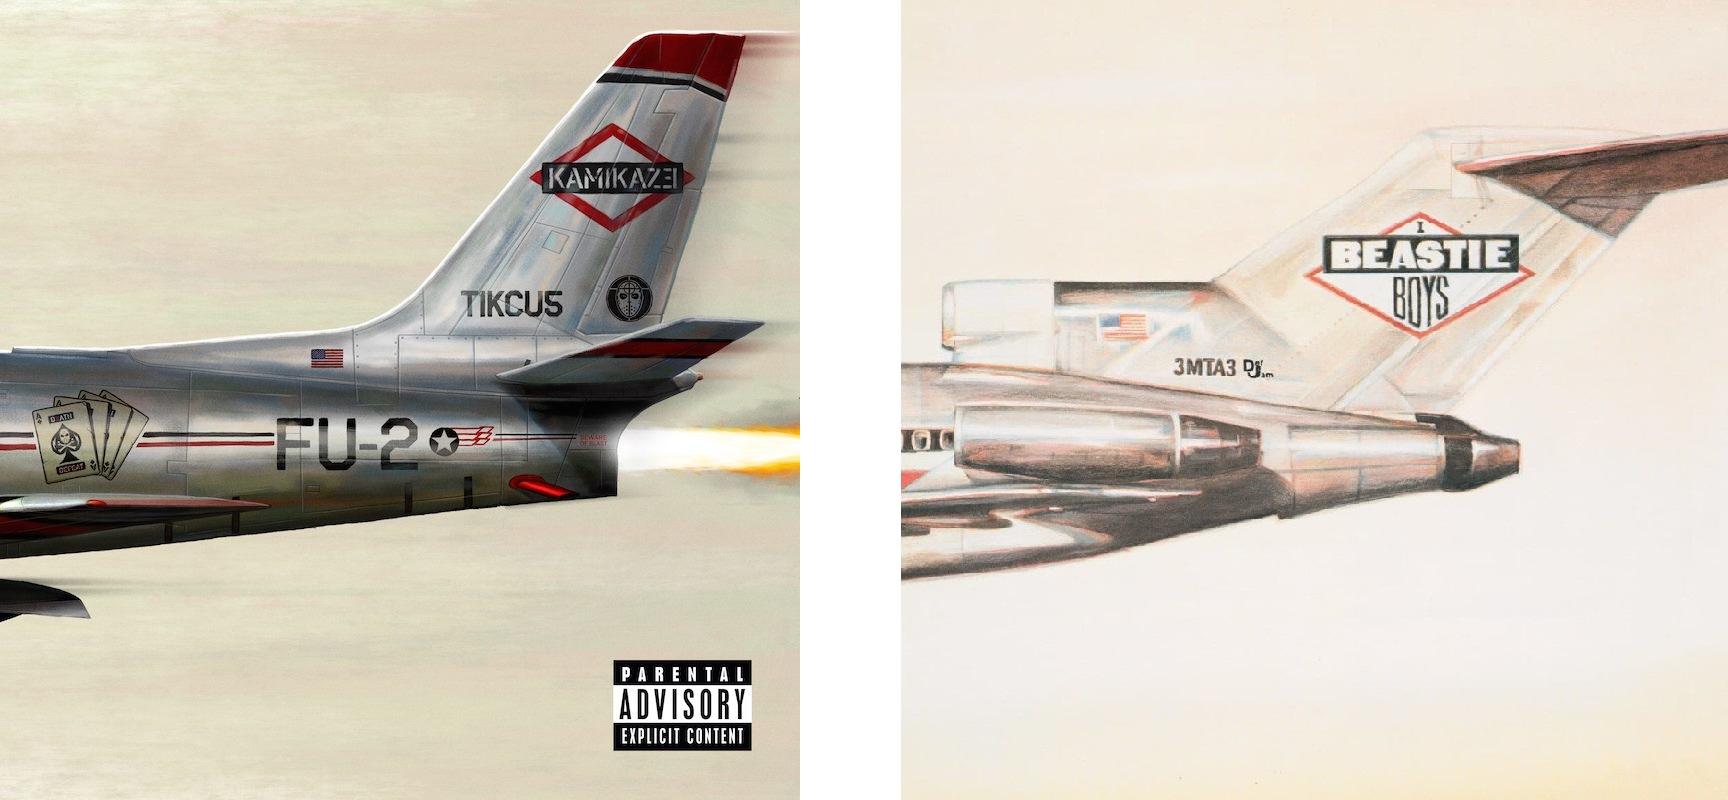 Eminema Kamikaze cover